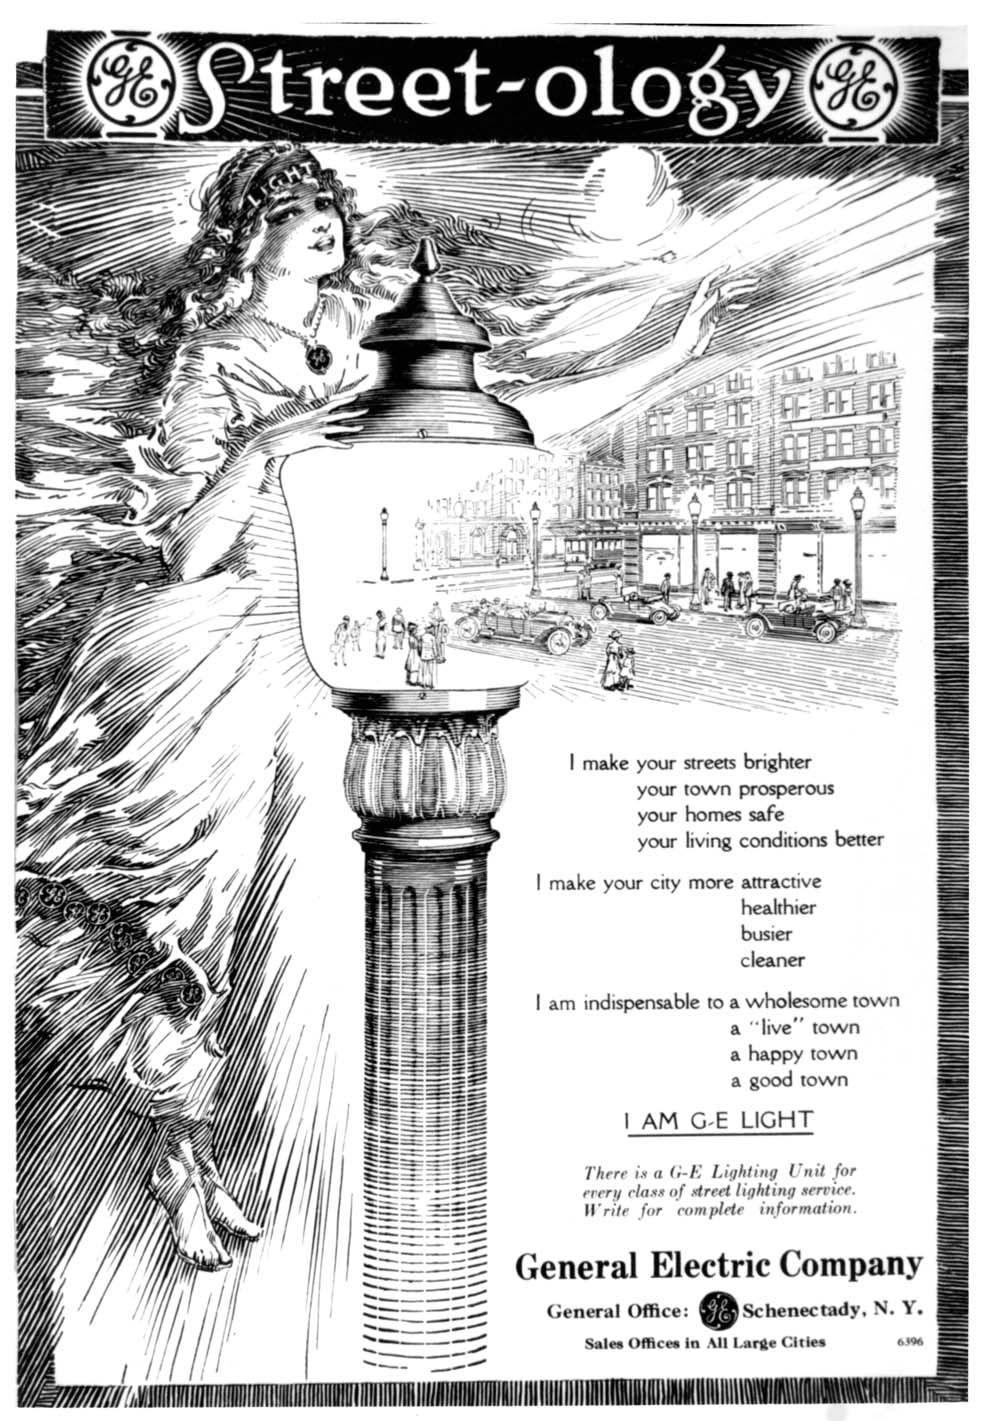 Street ology iluminaci n y ilustraciones - General electric iluminacion ...